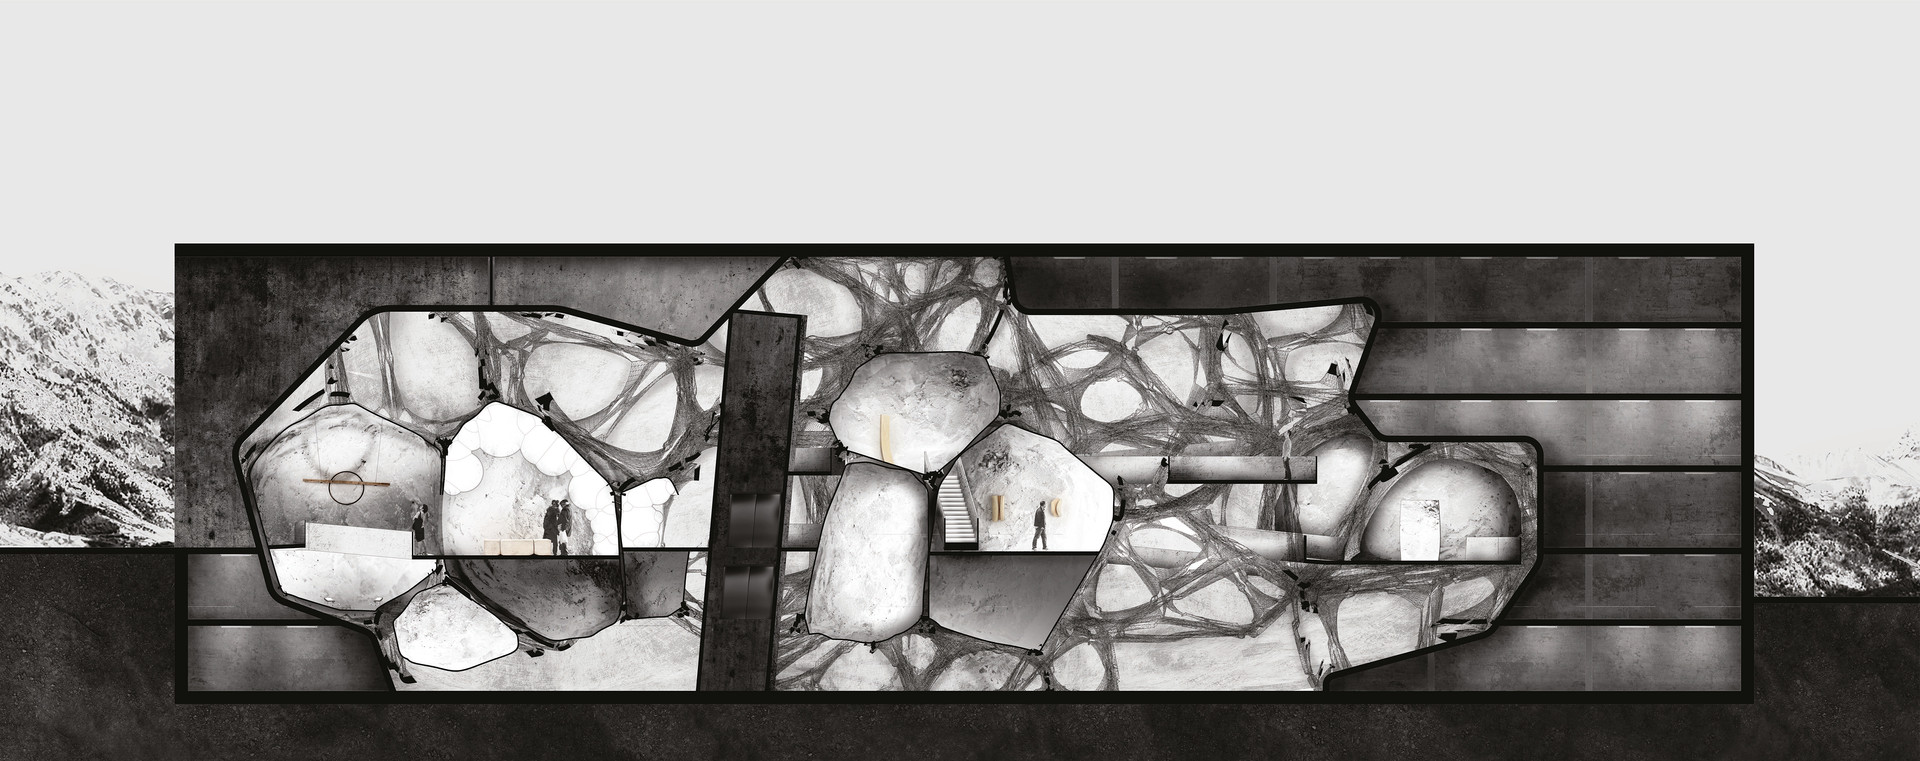 Cocoon Art Space | © Christian Baumgarten